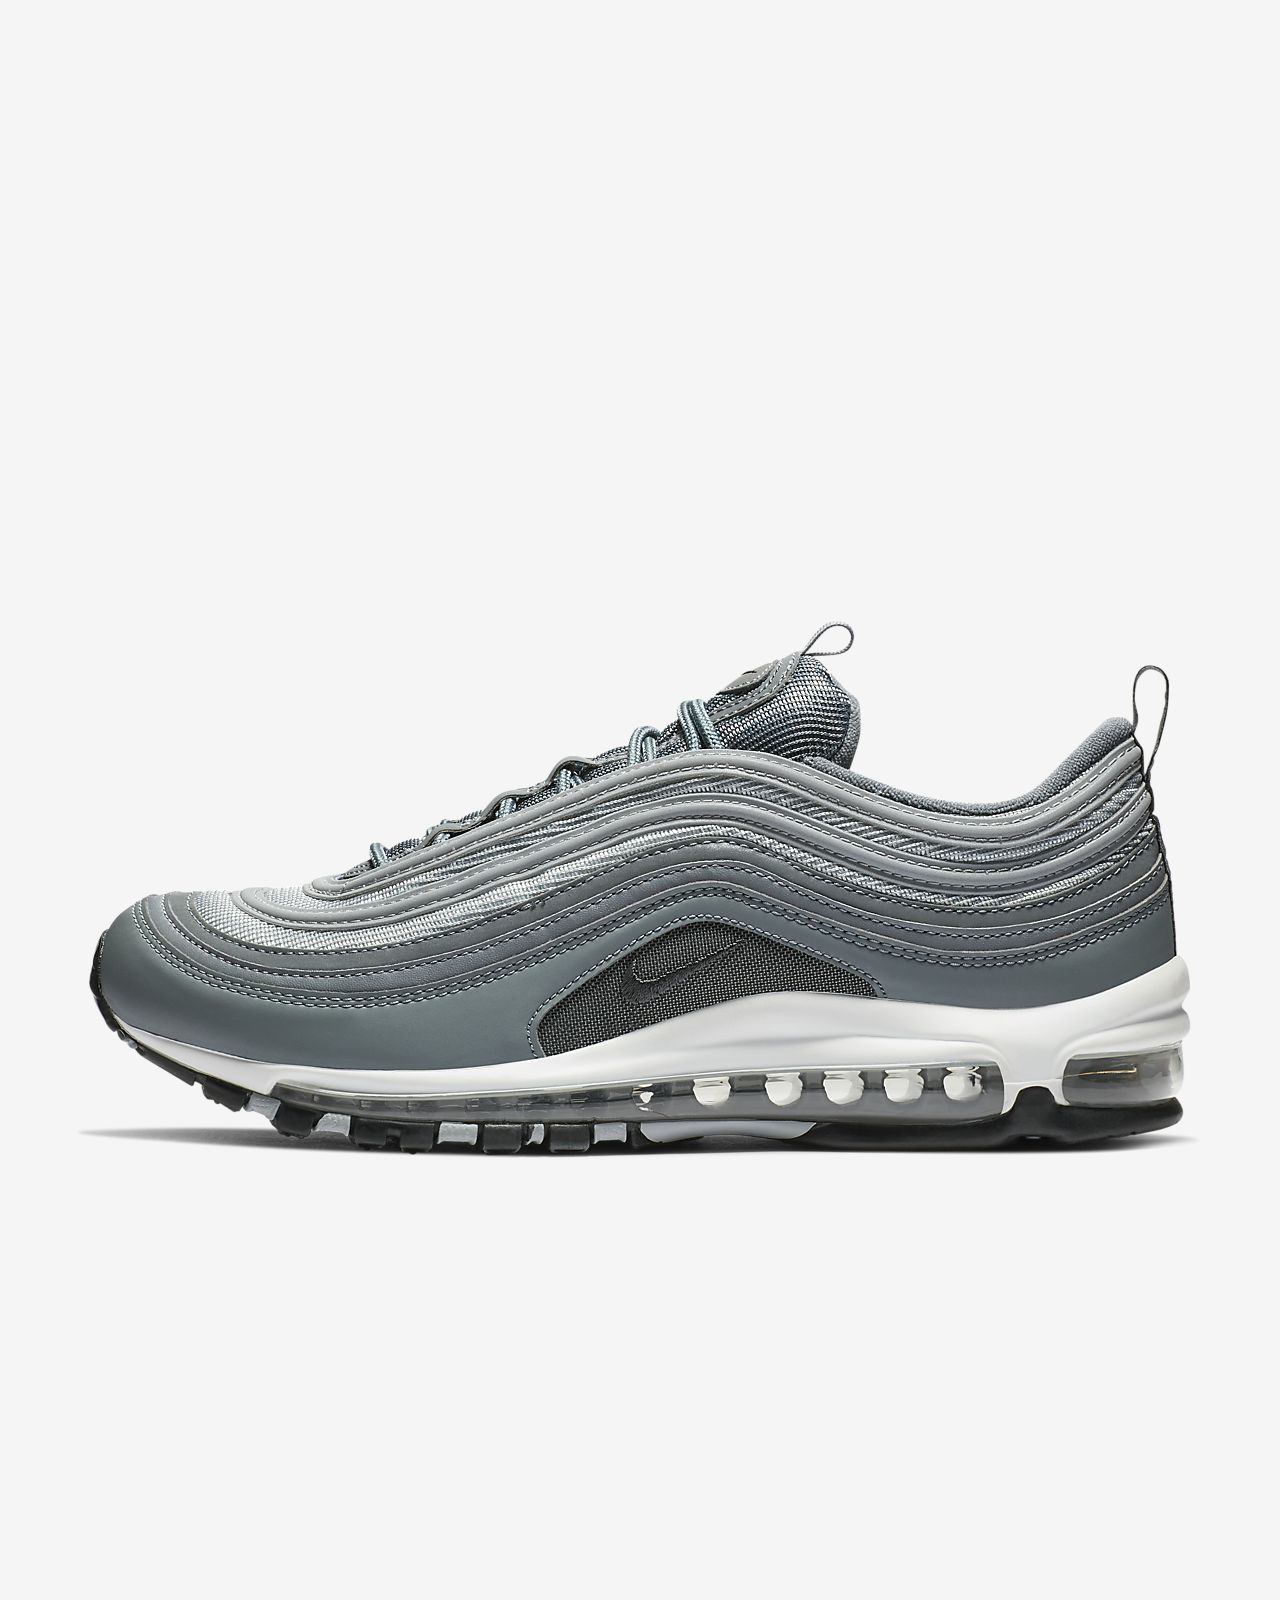 new product 411c6 e2ed4 ... Nike Air Max 97 Essential-sko til mænd